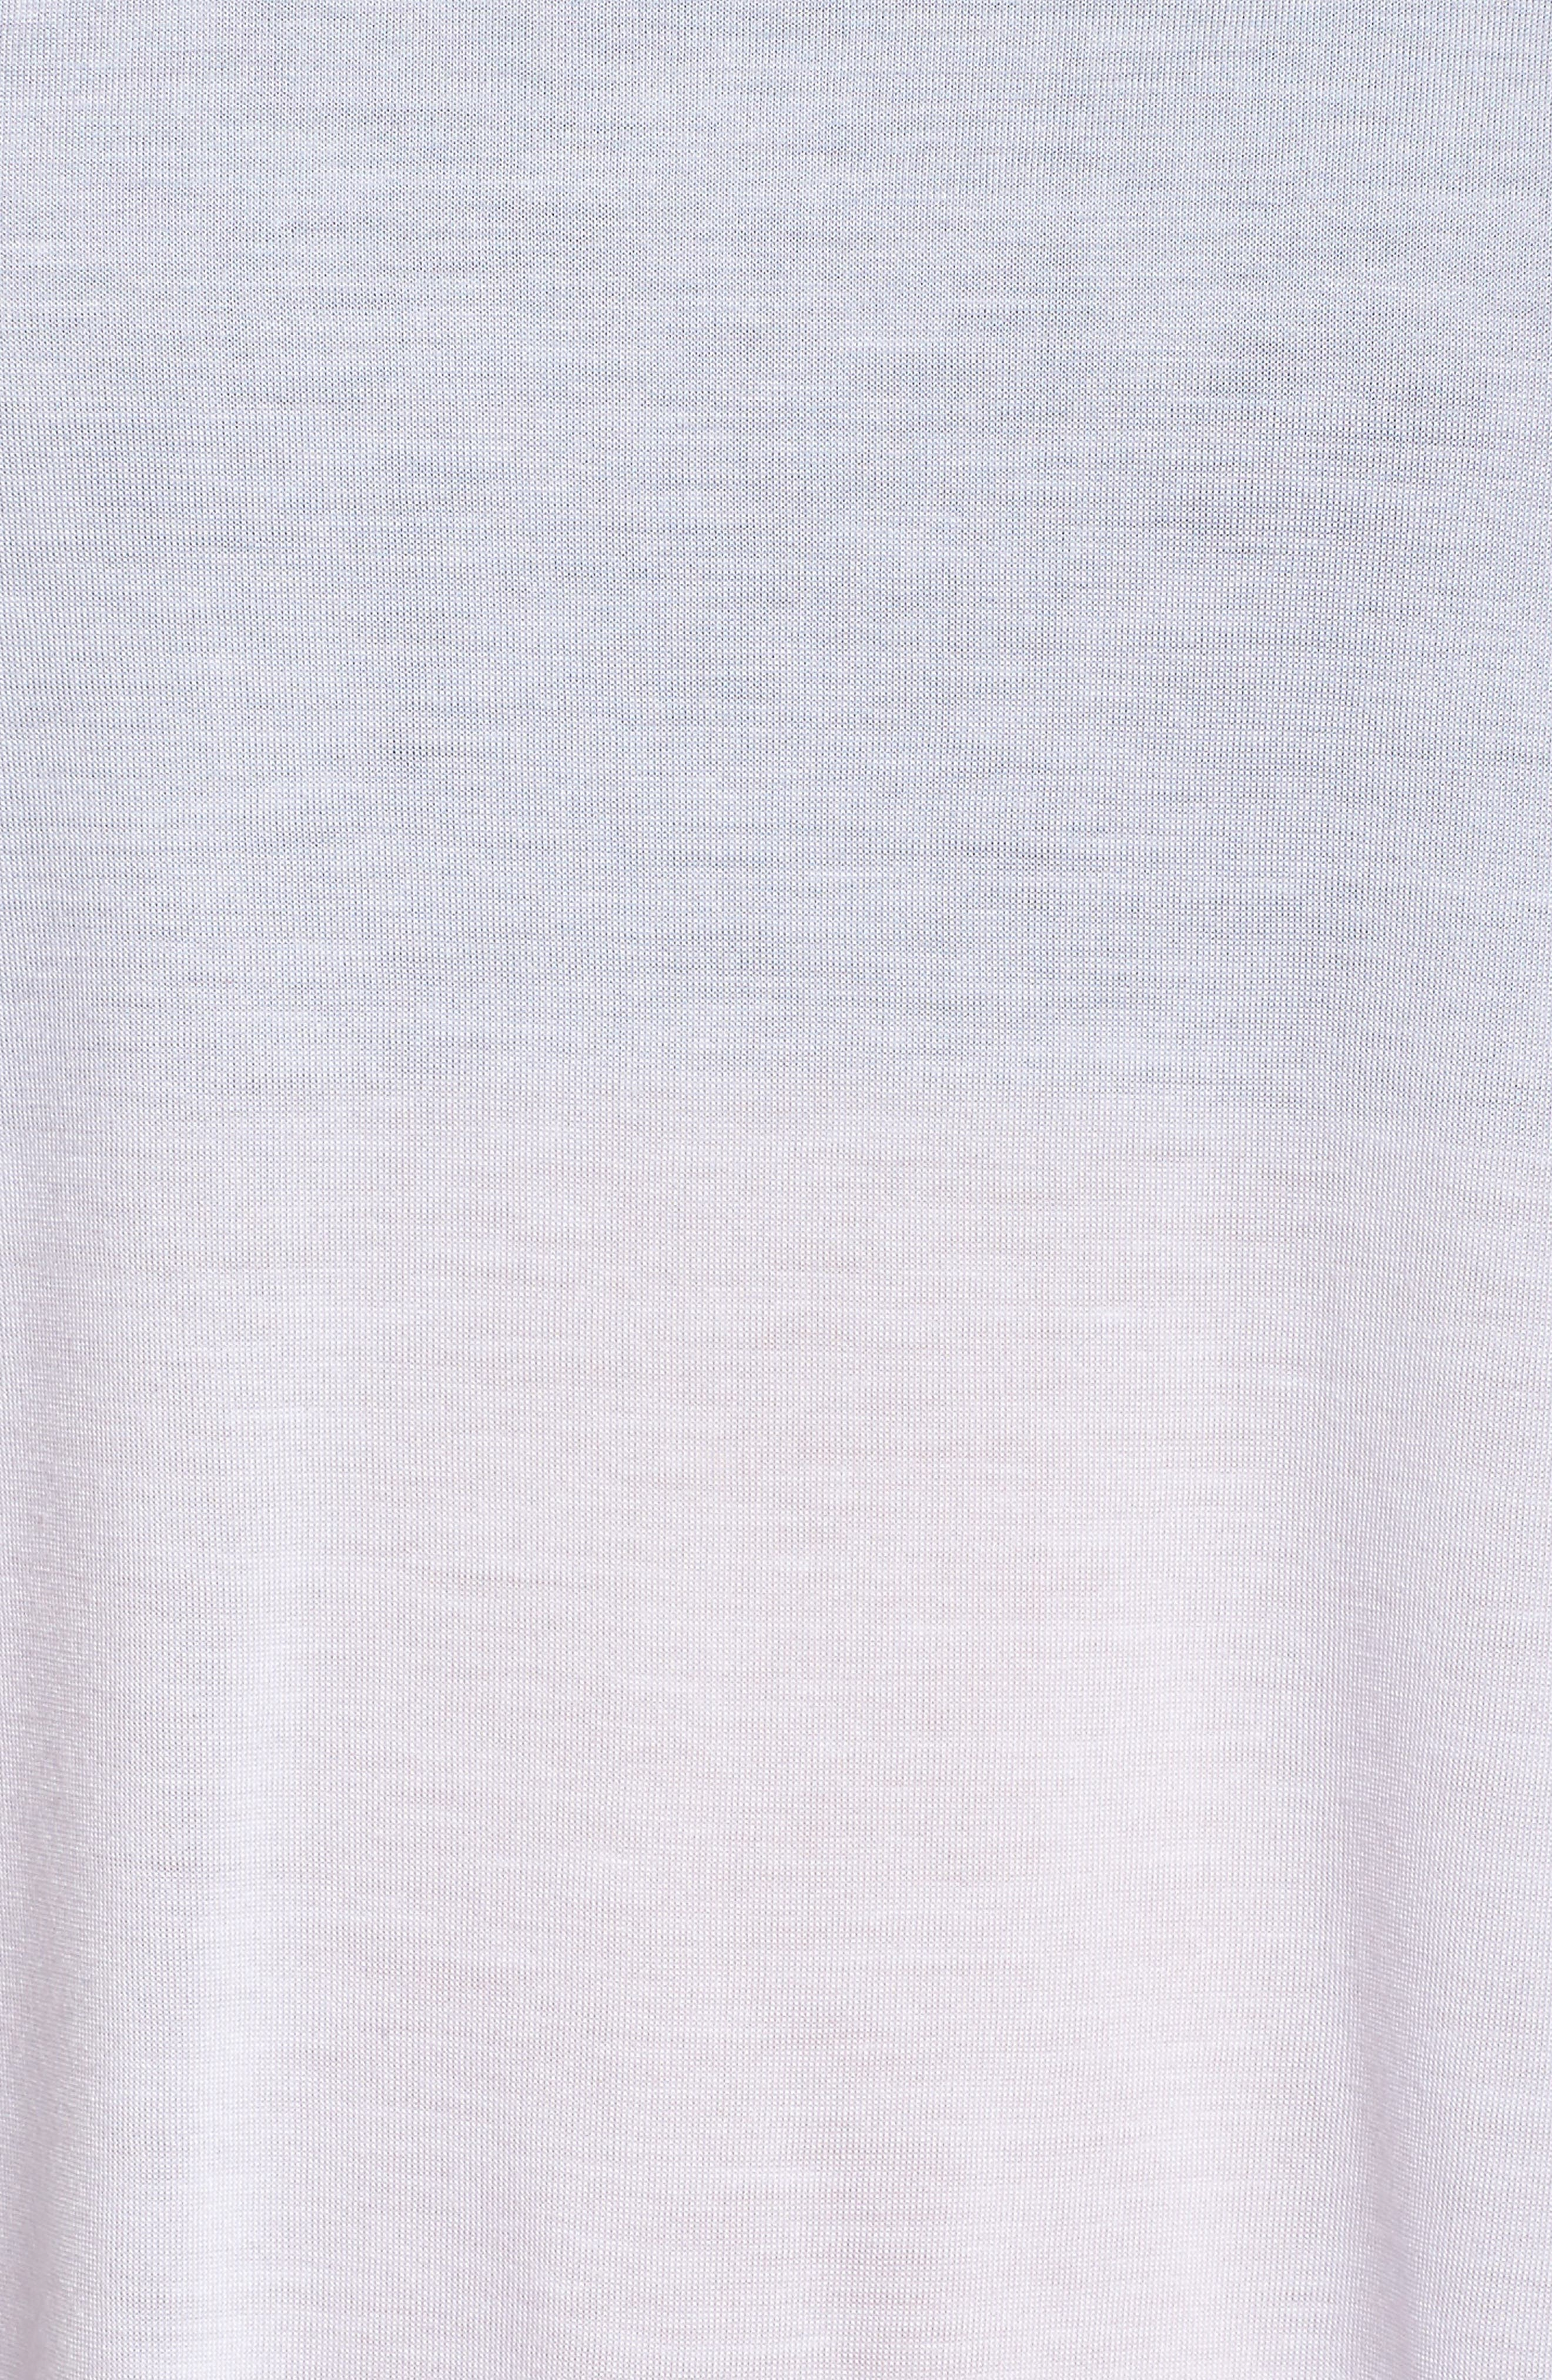 Tone Short Sleeve Tee,                             Alternate thumbnail 6, color,                             White